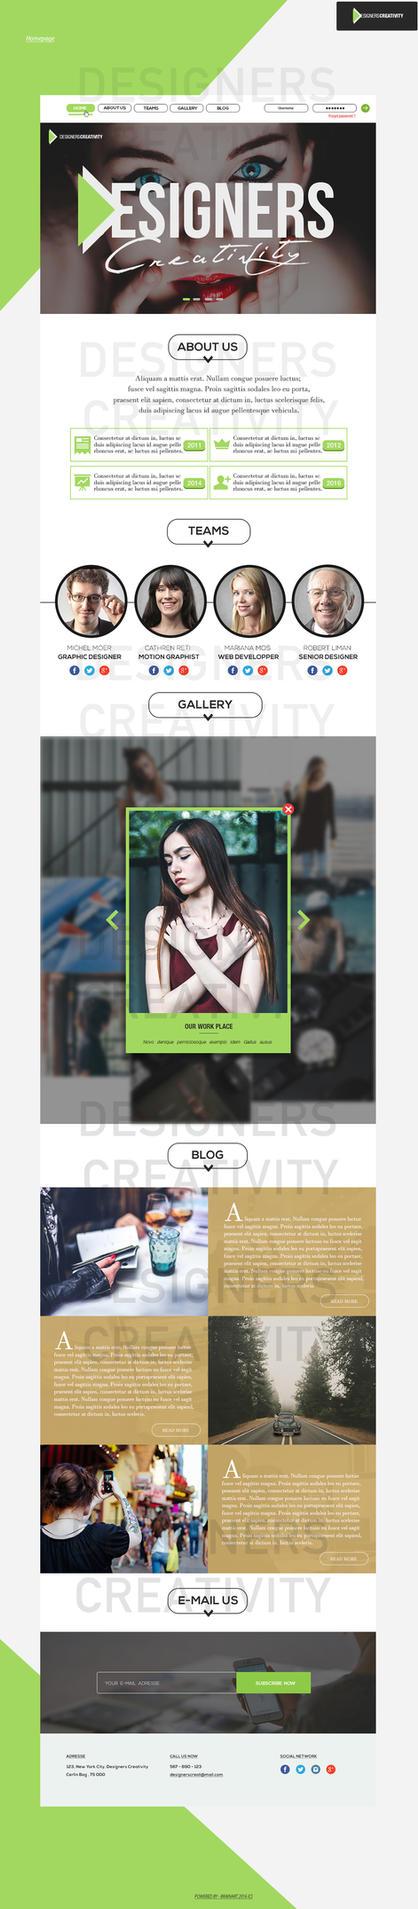 Designers Creativity PSD Tamplate - Homepage by Hz-designer